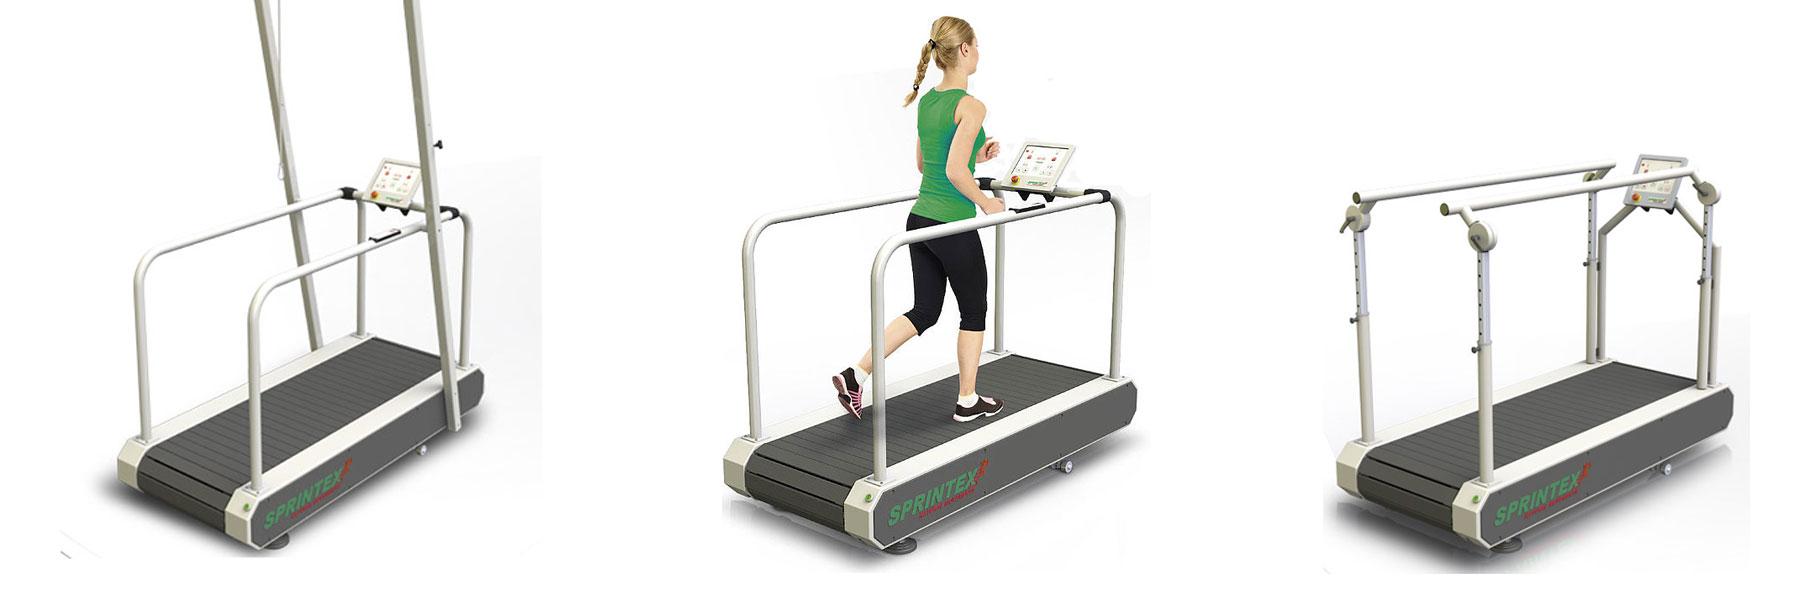 Sprintex Ortho Treadmill for Running Gait Analysis